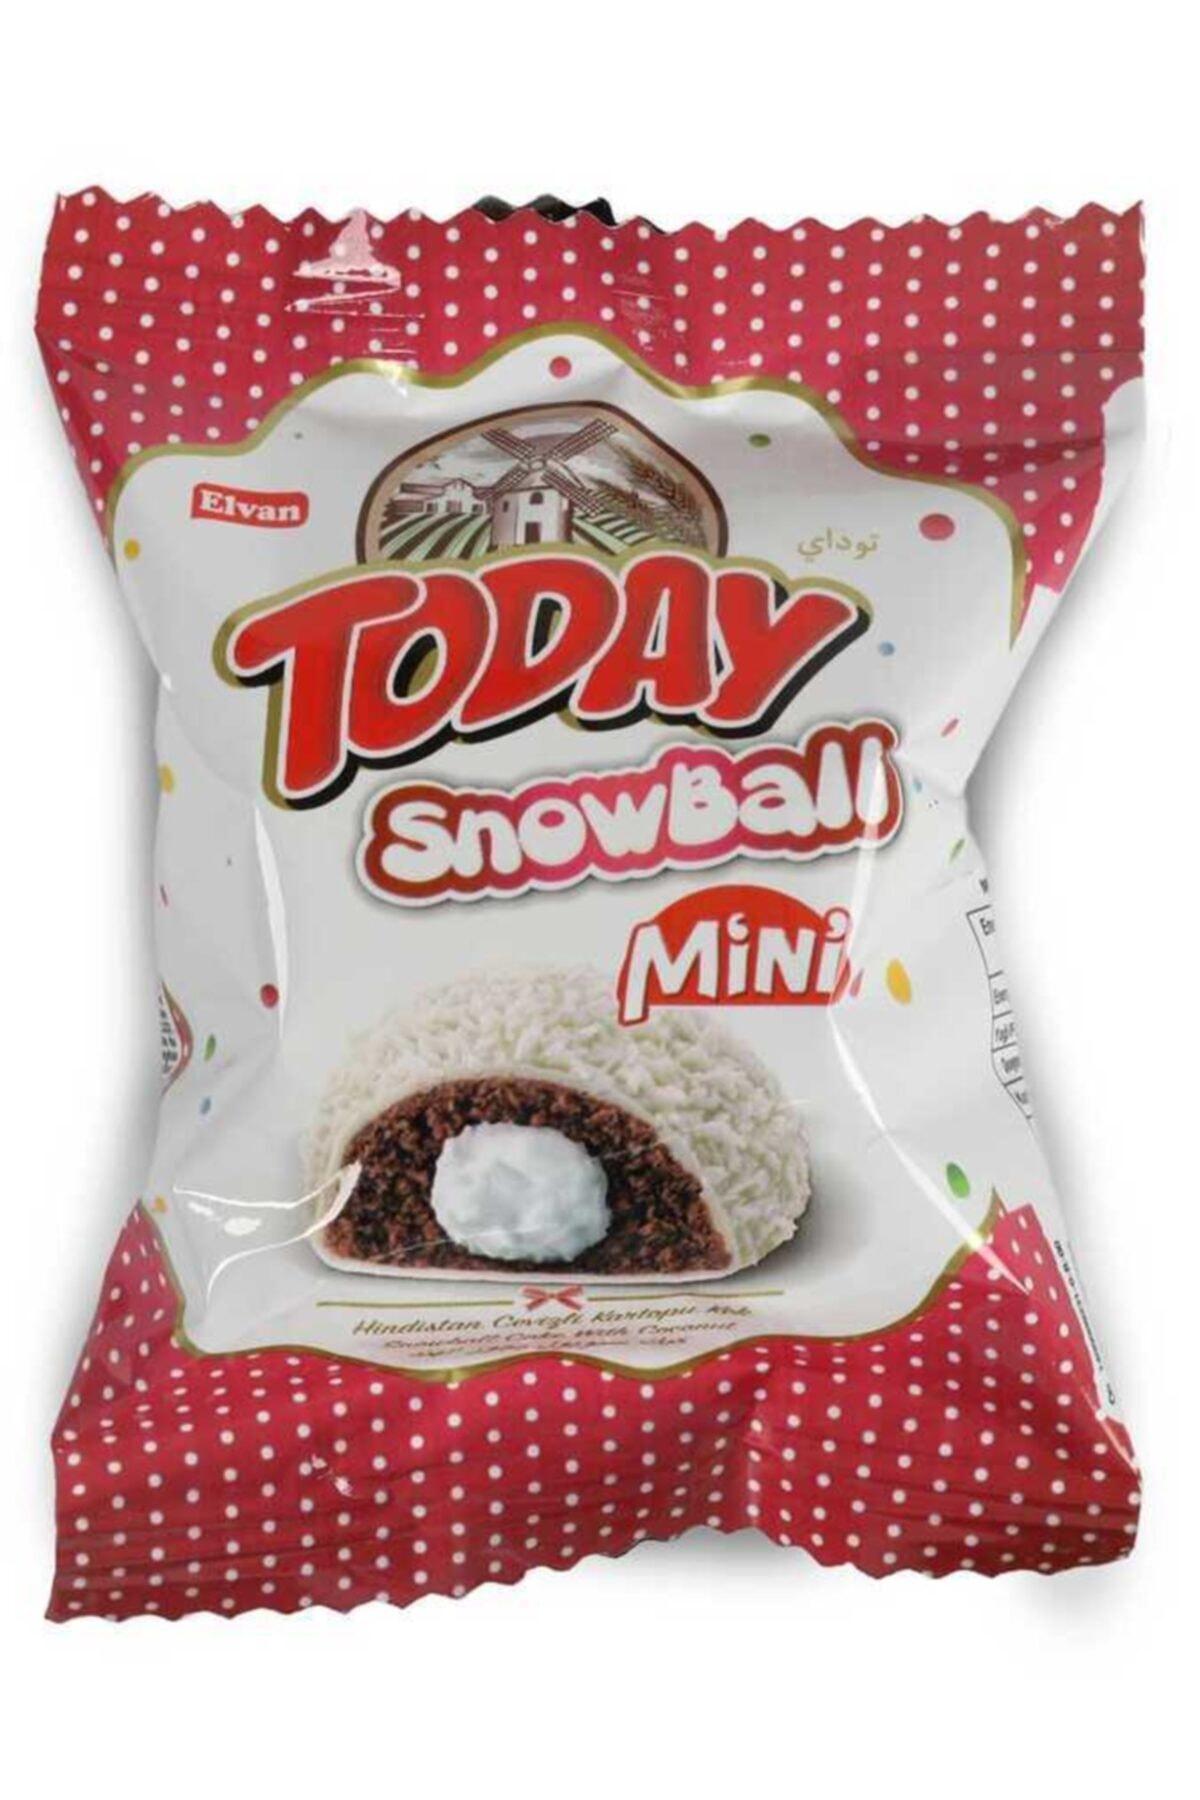 Elvan Today Snowball Mini Hindistan Cevizli Kek 25 Gr. 24 Adet (1 Kutu) 1